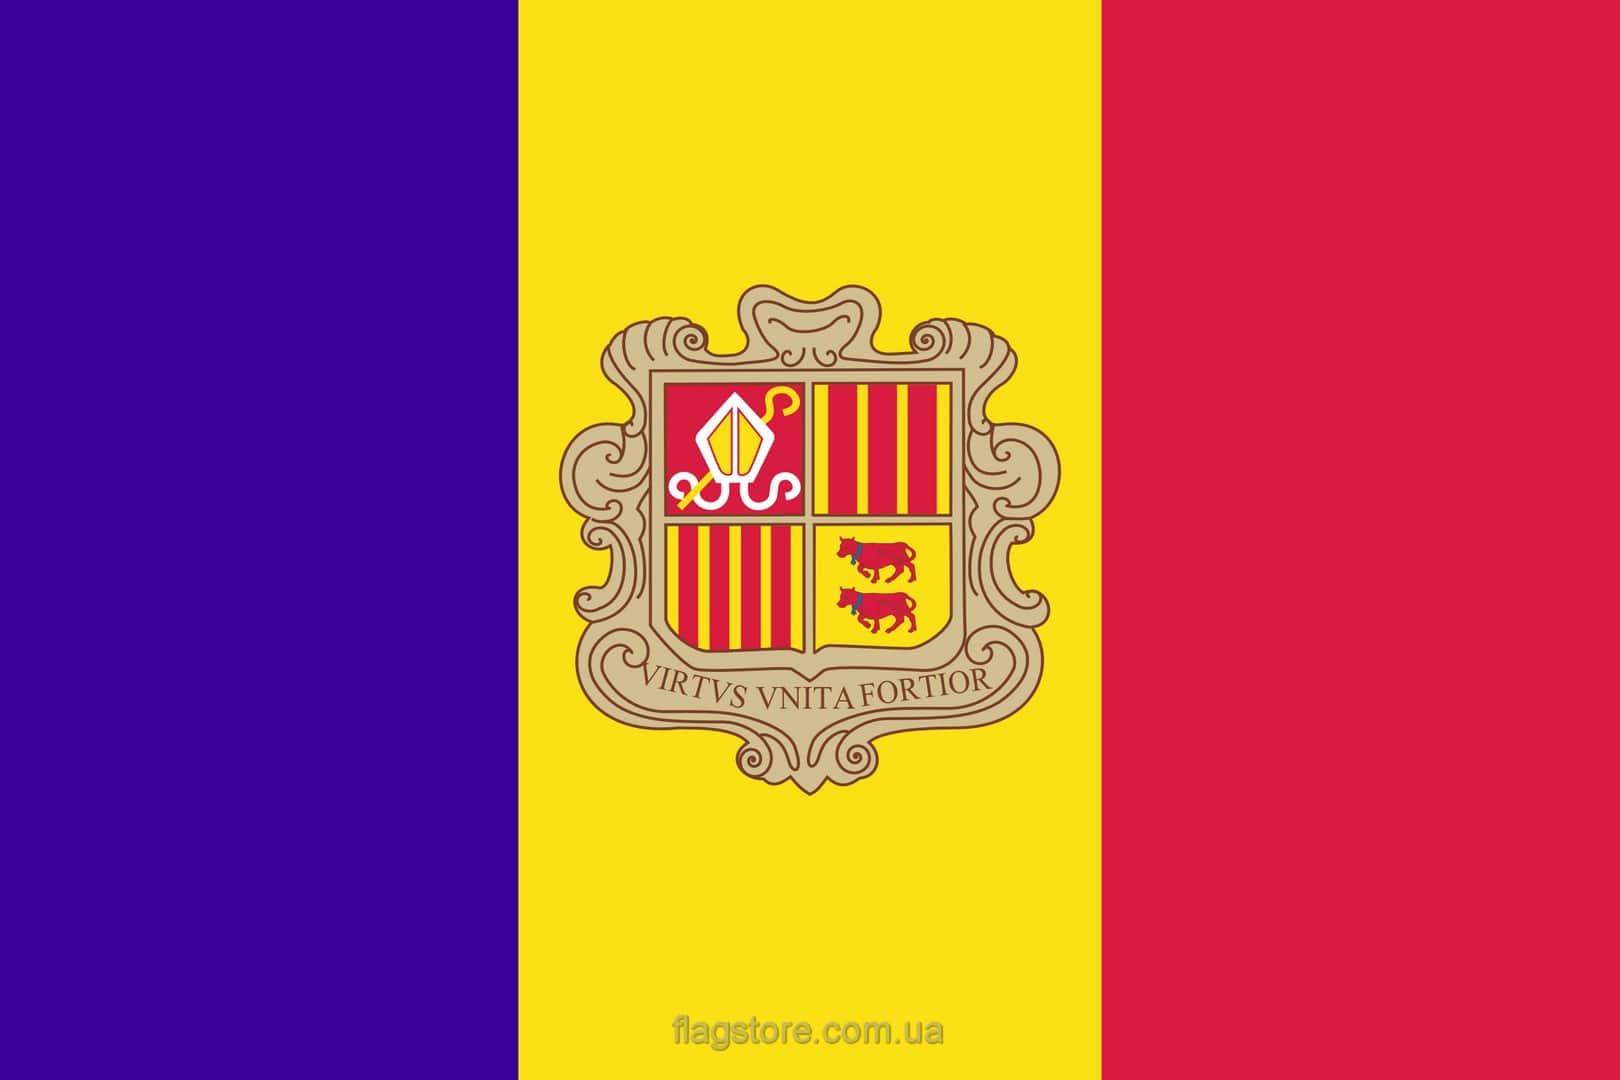 Купить флаг Андорры (страны Андорра)